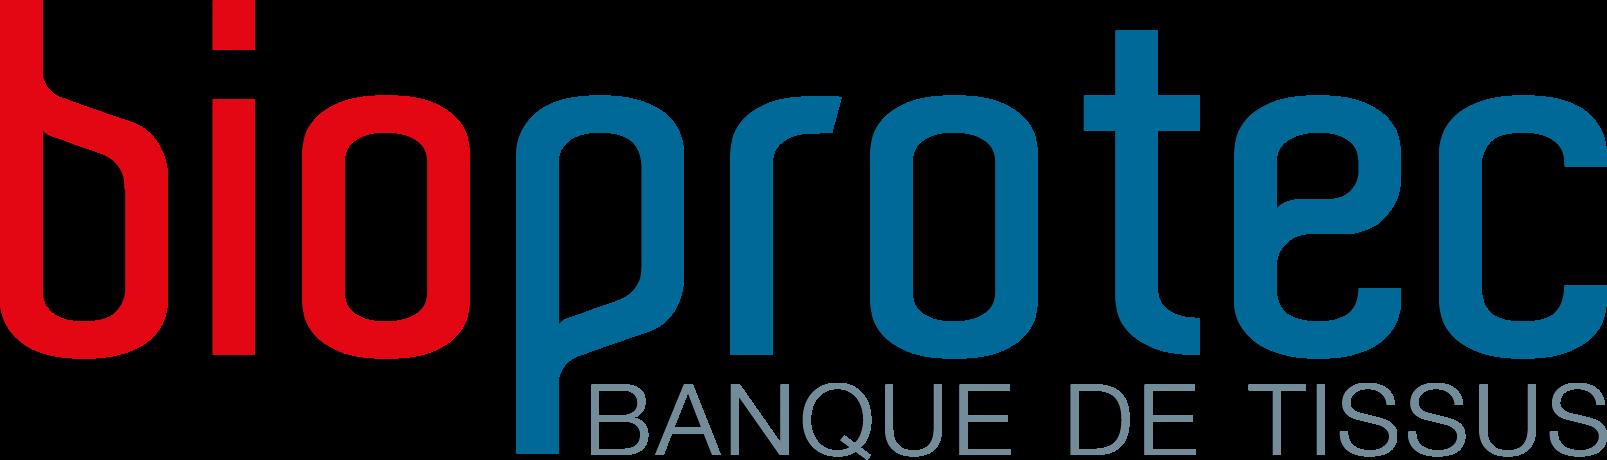 cropped-logo-bioprotec-2.png